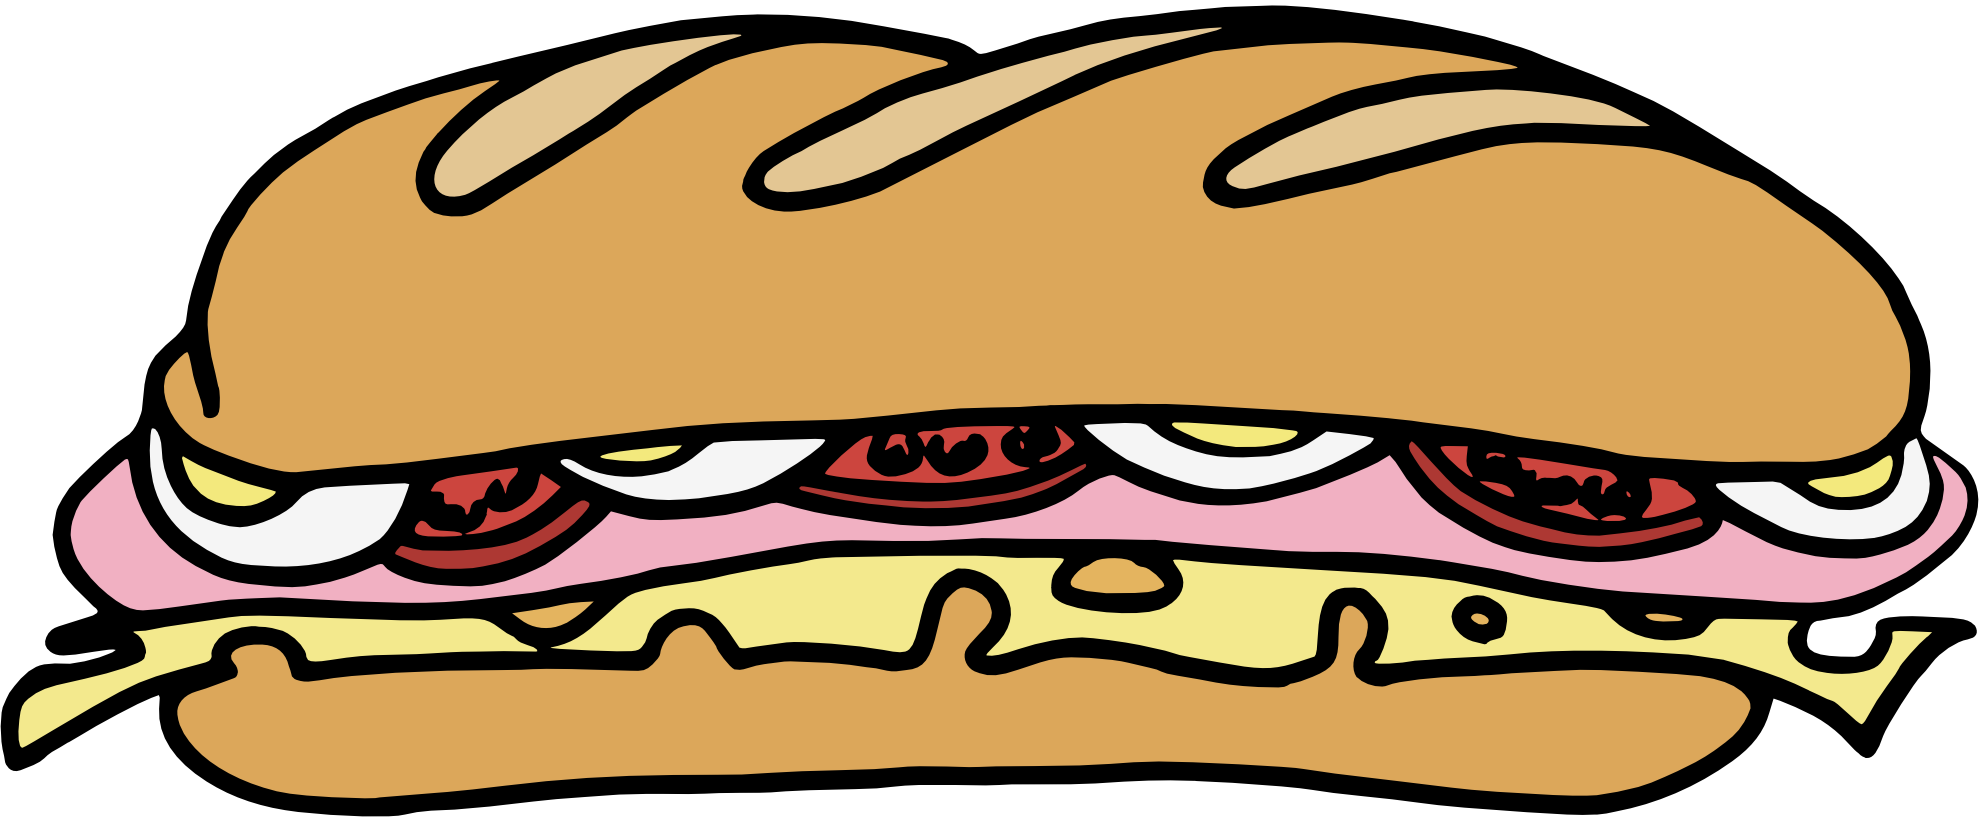 sandwich clip art cliparts co Sandwich Clip Art Ham and Cheese Sandwich Clip Art